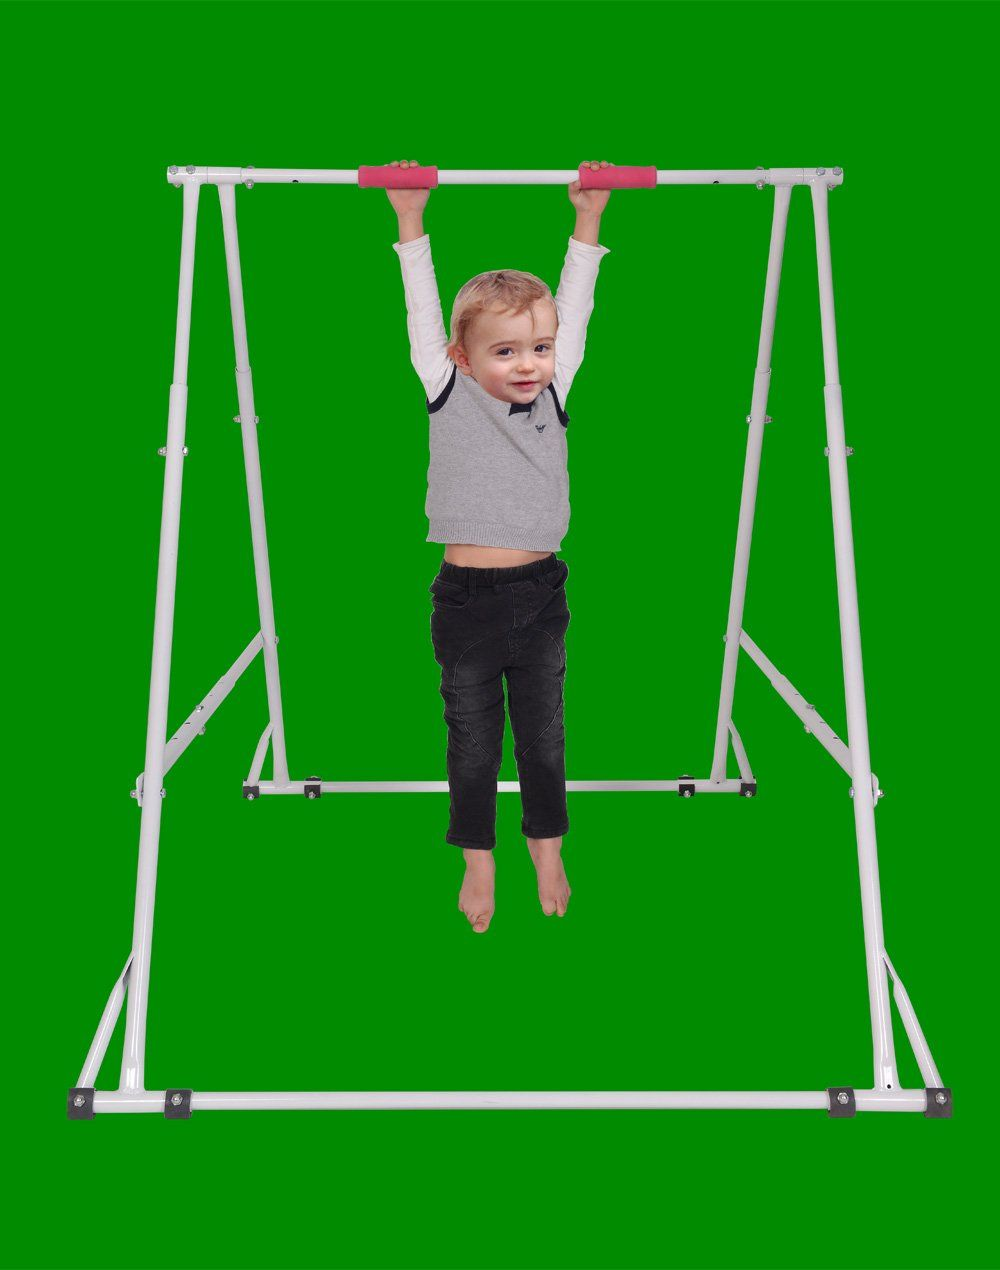 d0b80dc8d42 Home Workout Gymnastics Bar For Kids  Height Adjustable Chin Up Bar Model  KT1.0914